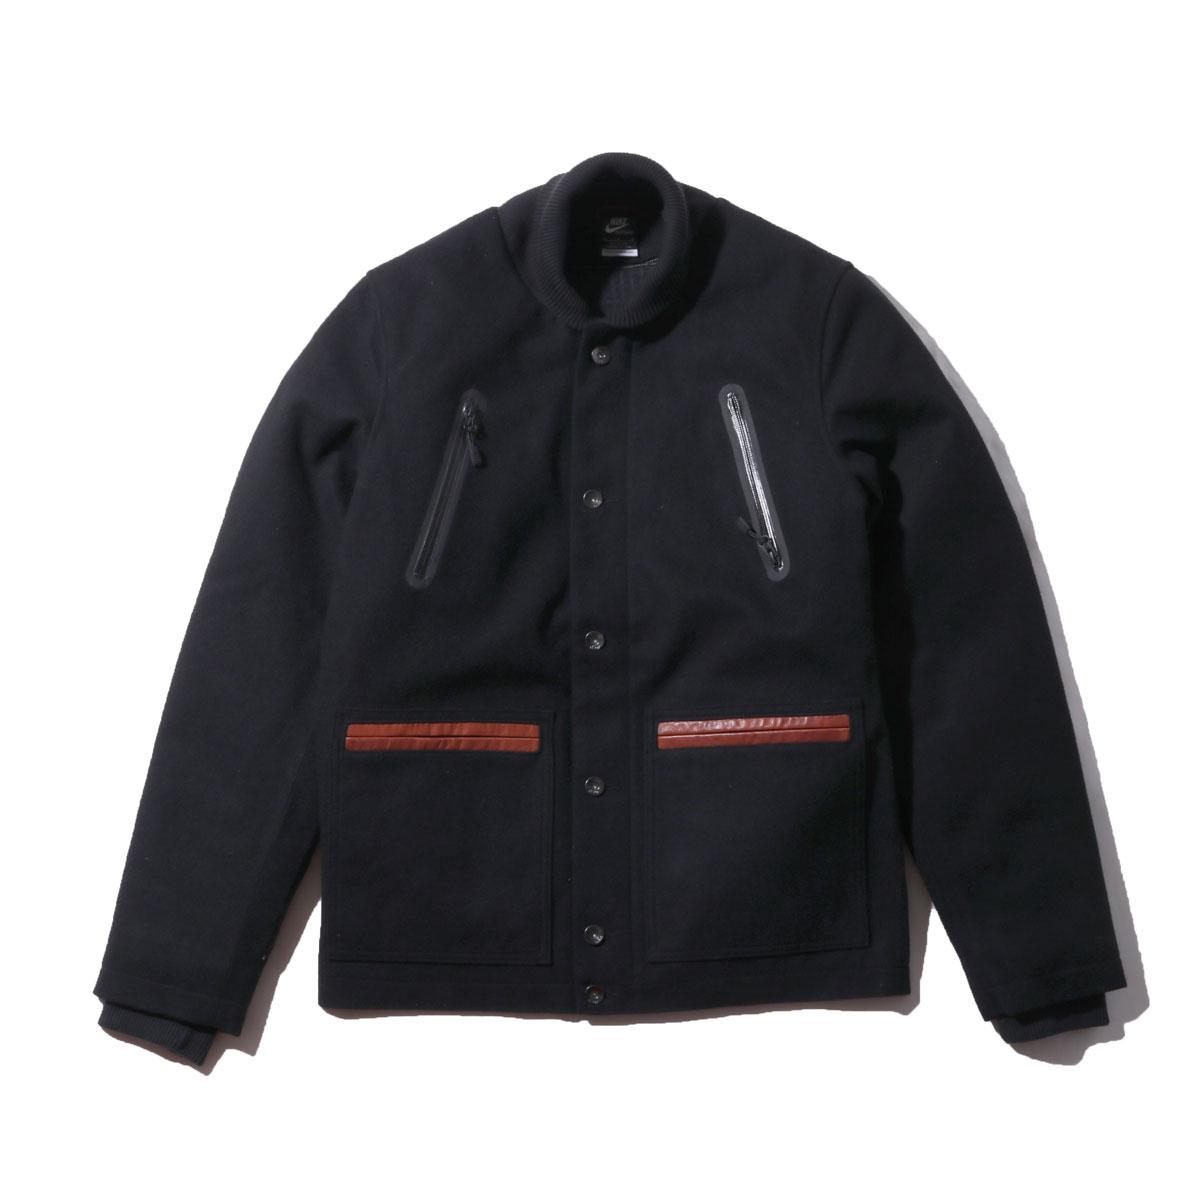 NIKE AS NSW WOOL JACKET(ナイキ AS NSW ウール ジャケット)BLACK【メンズ ジャケット】